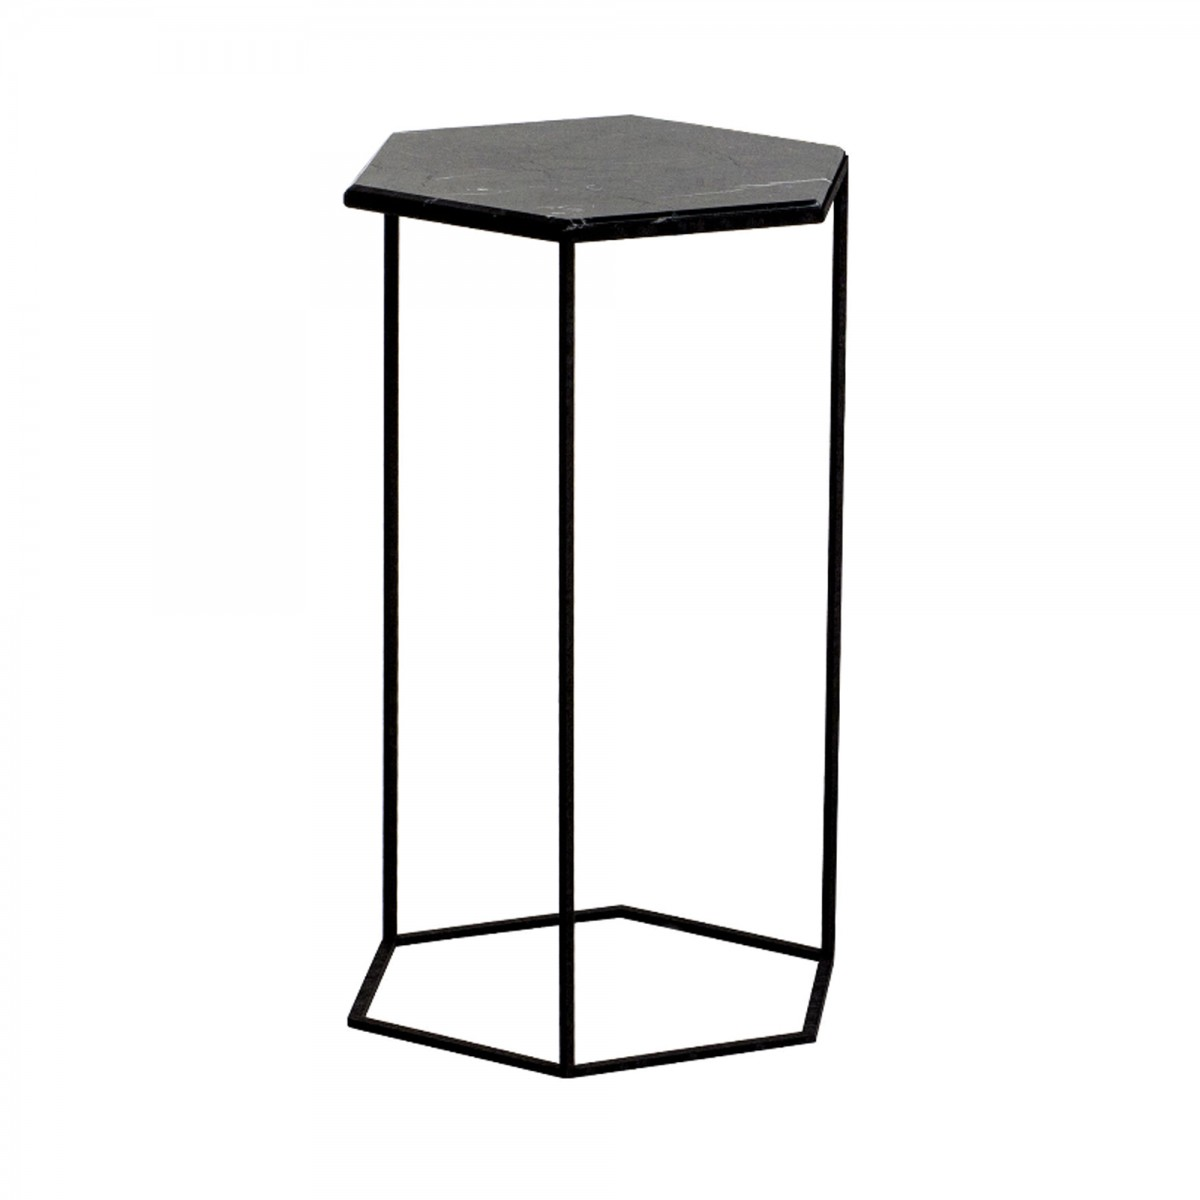 beste von table en marbre id es de conception de table basse. Black Bedroom Furniture Sets. Home Design Ideas